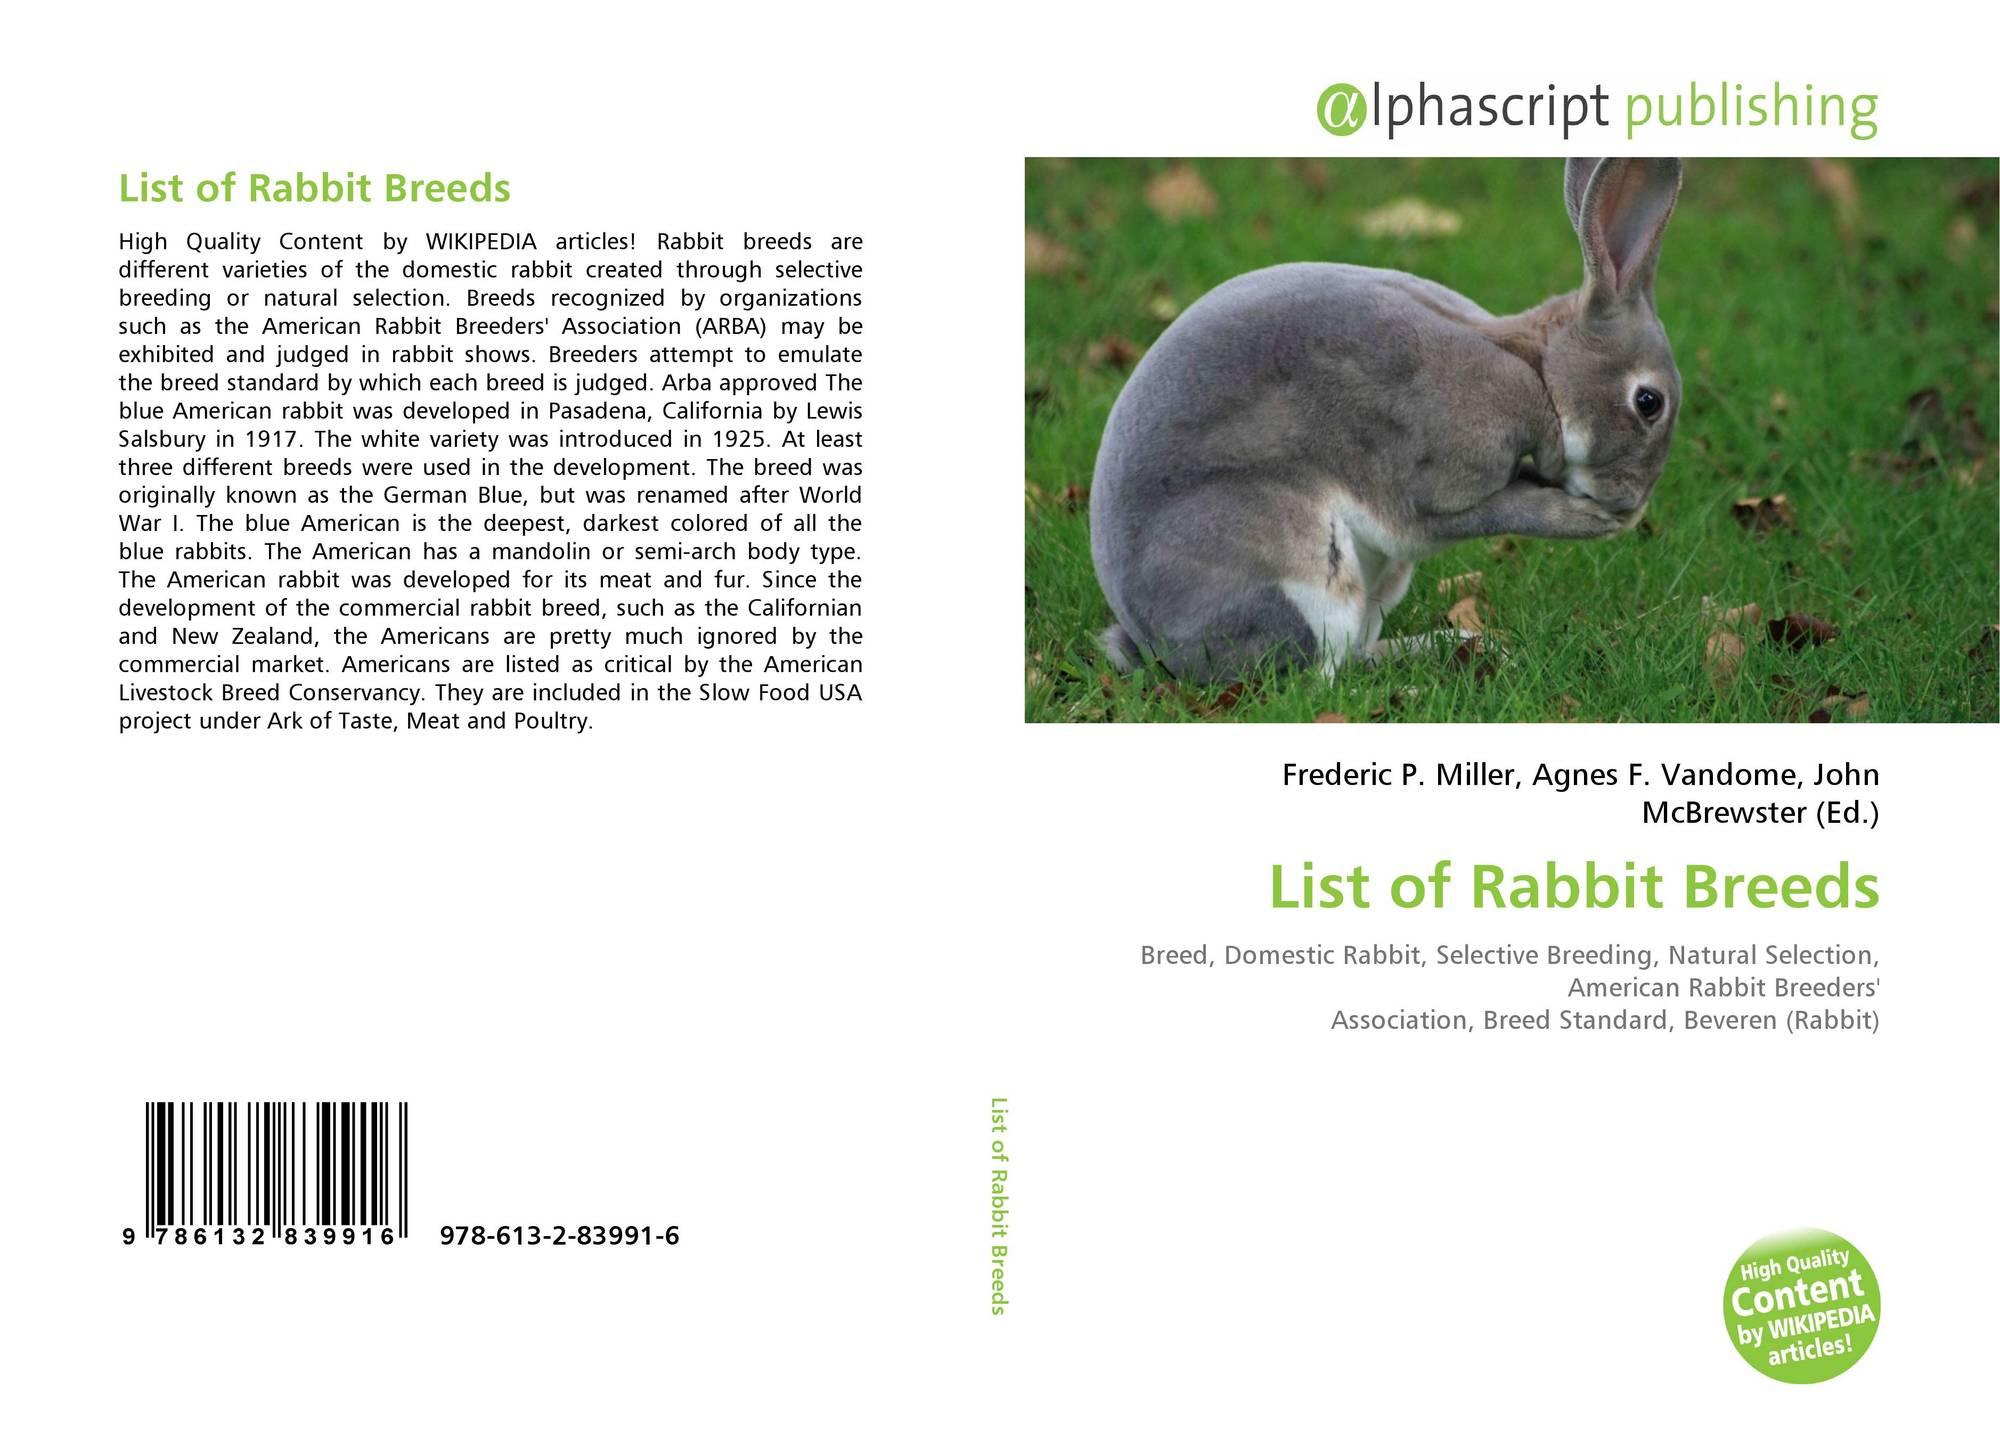 List of Rabbit Breeds, 978-613-2-83991-6, 6132839917